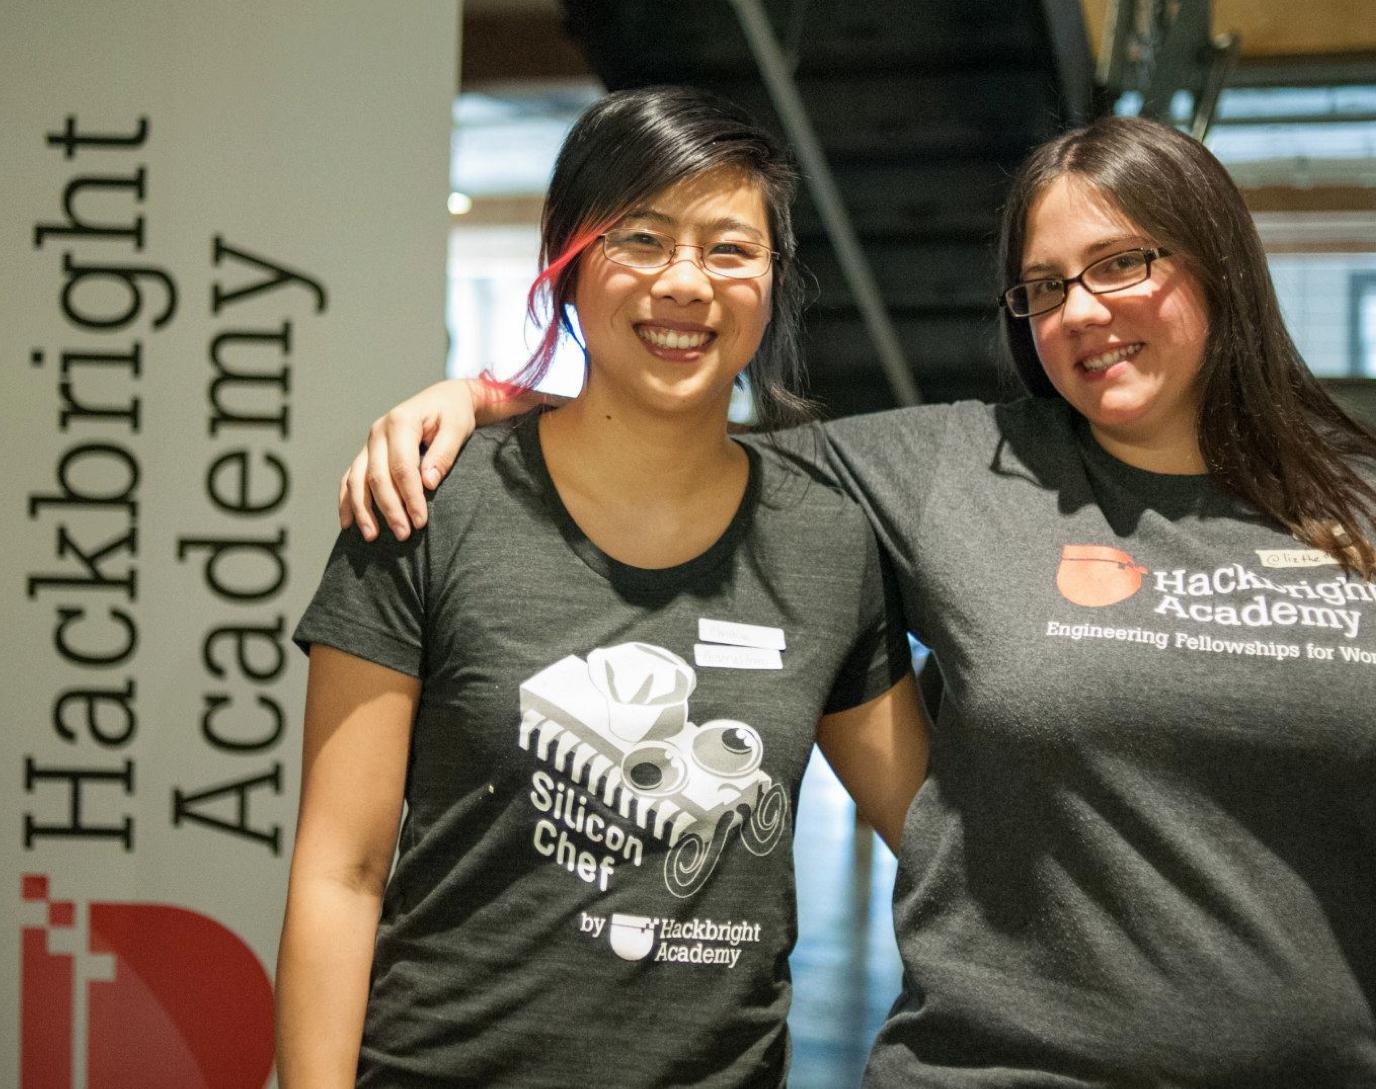 hackbright_academy_silicon_chef_2013_organizers